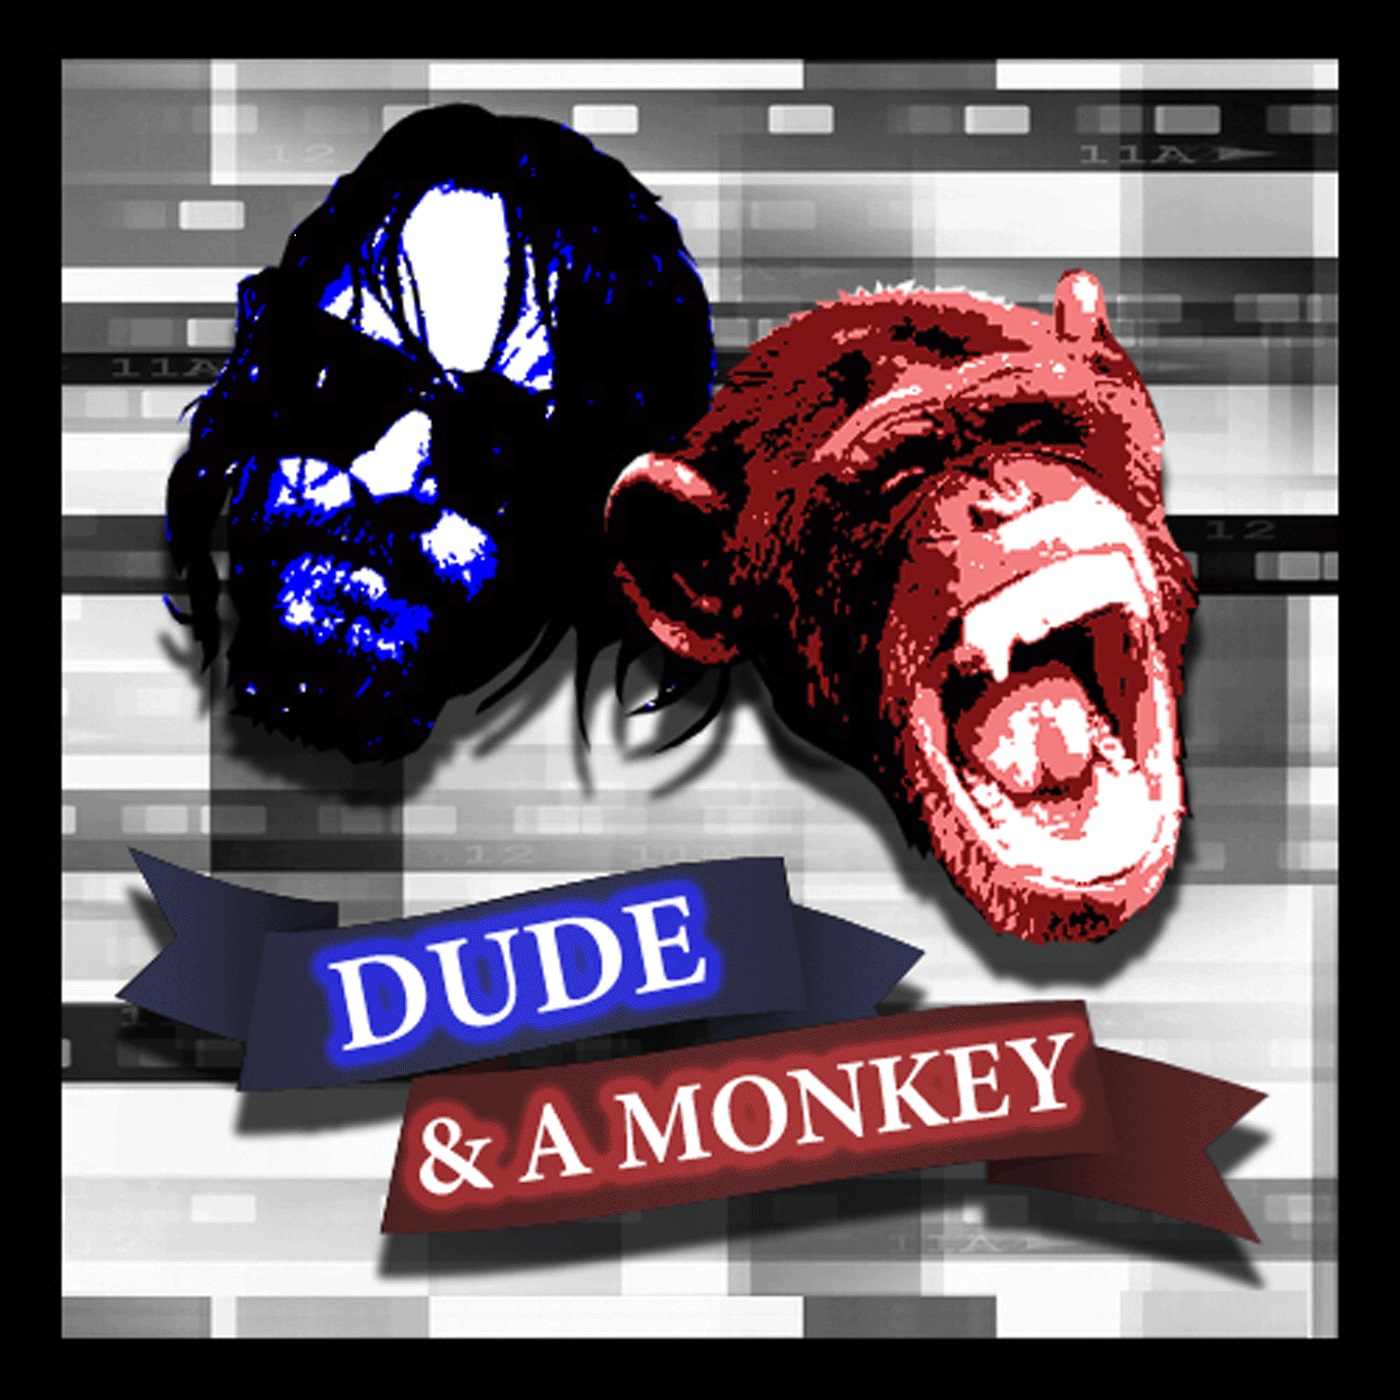 Dude & A Monkey logo